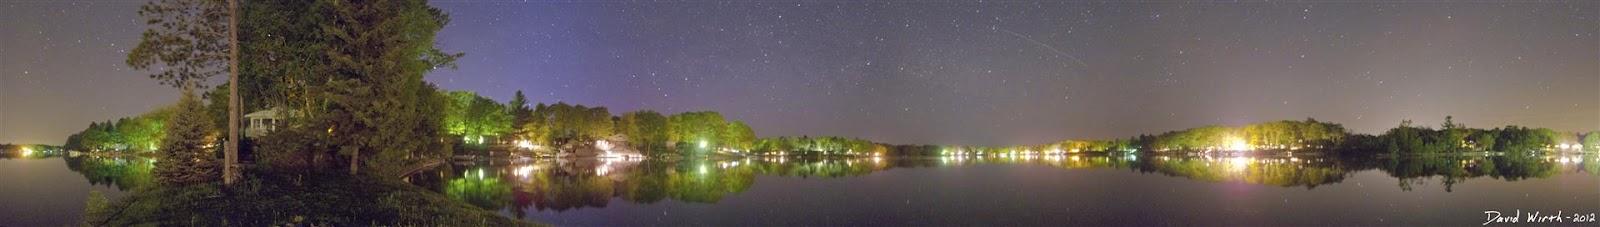 star lake panorama, reflection at night